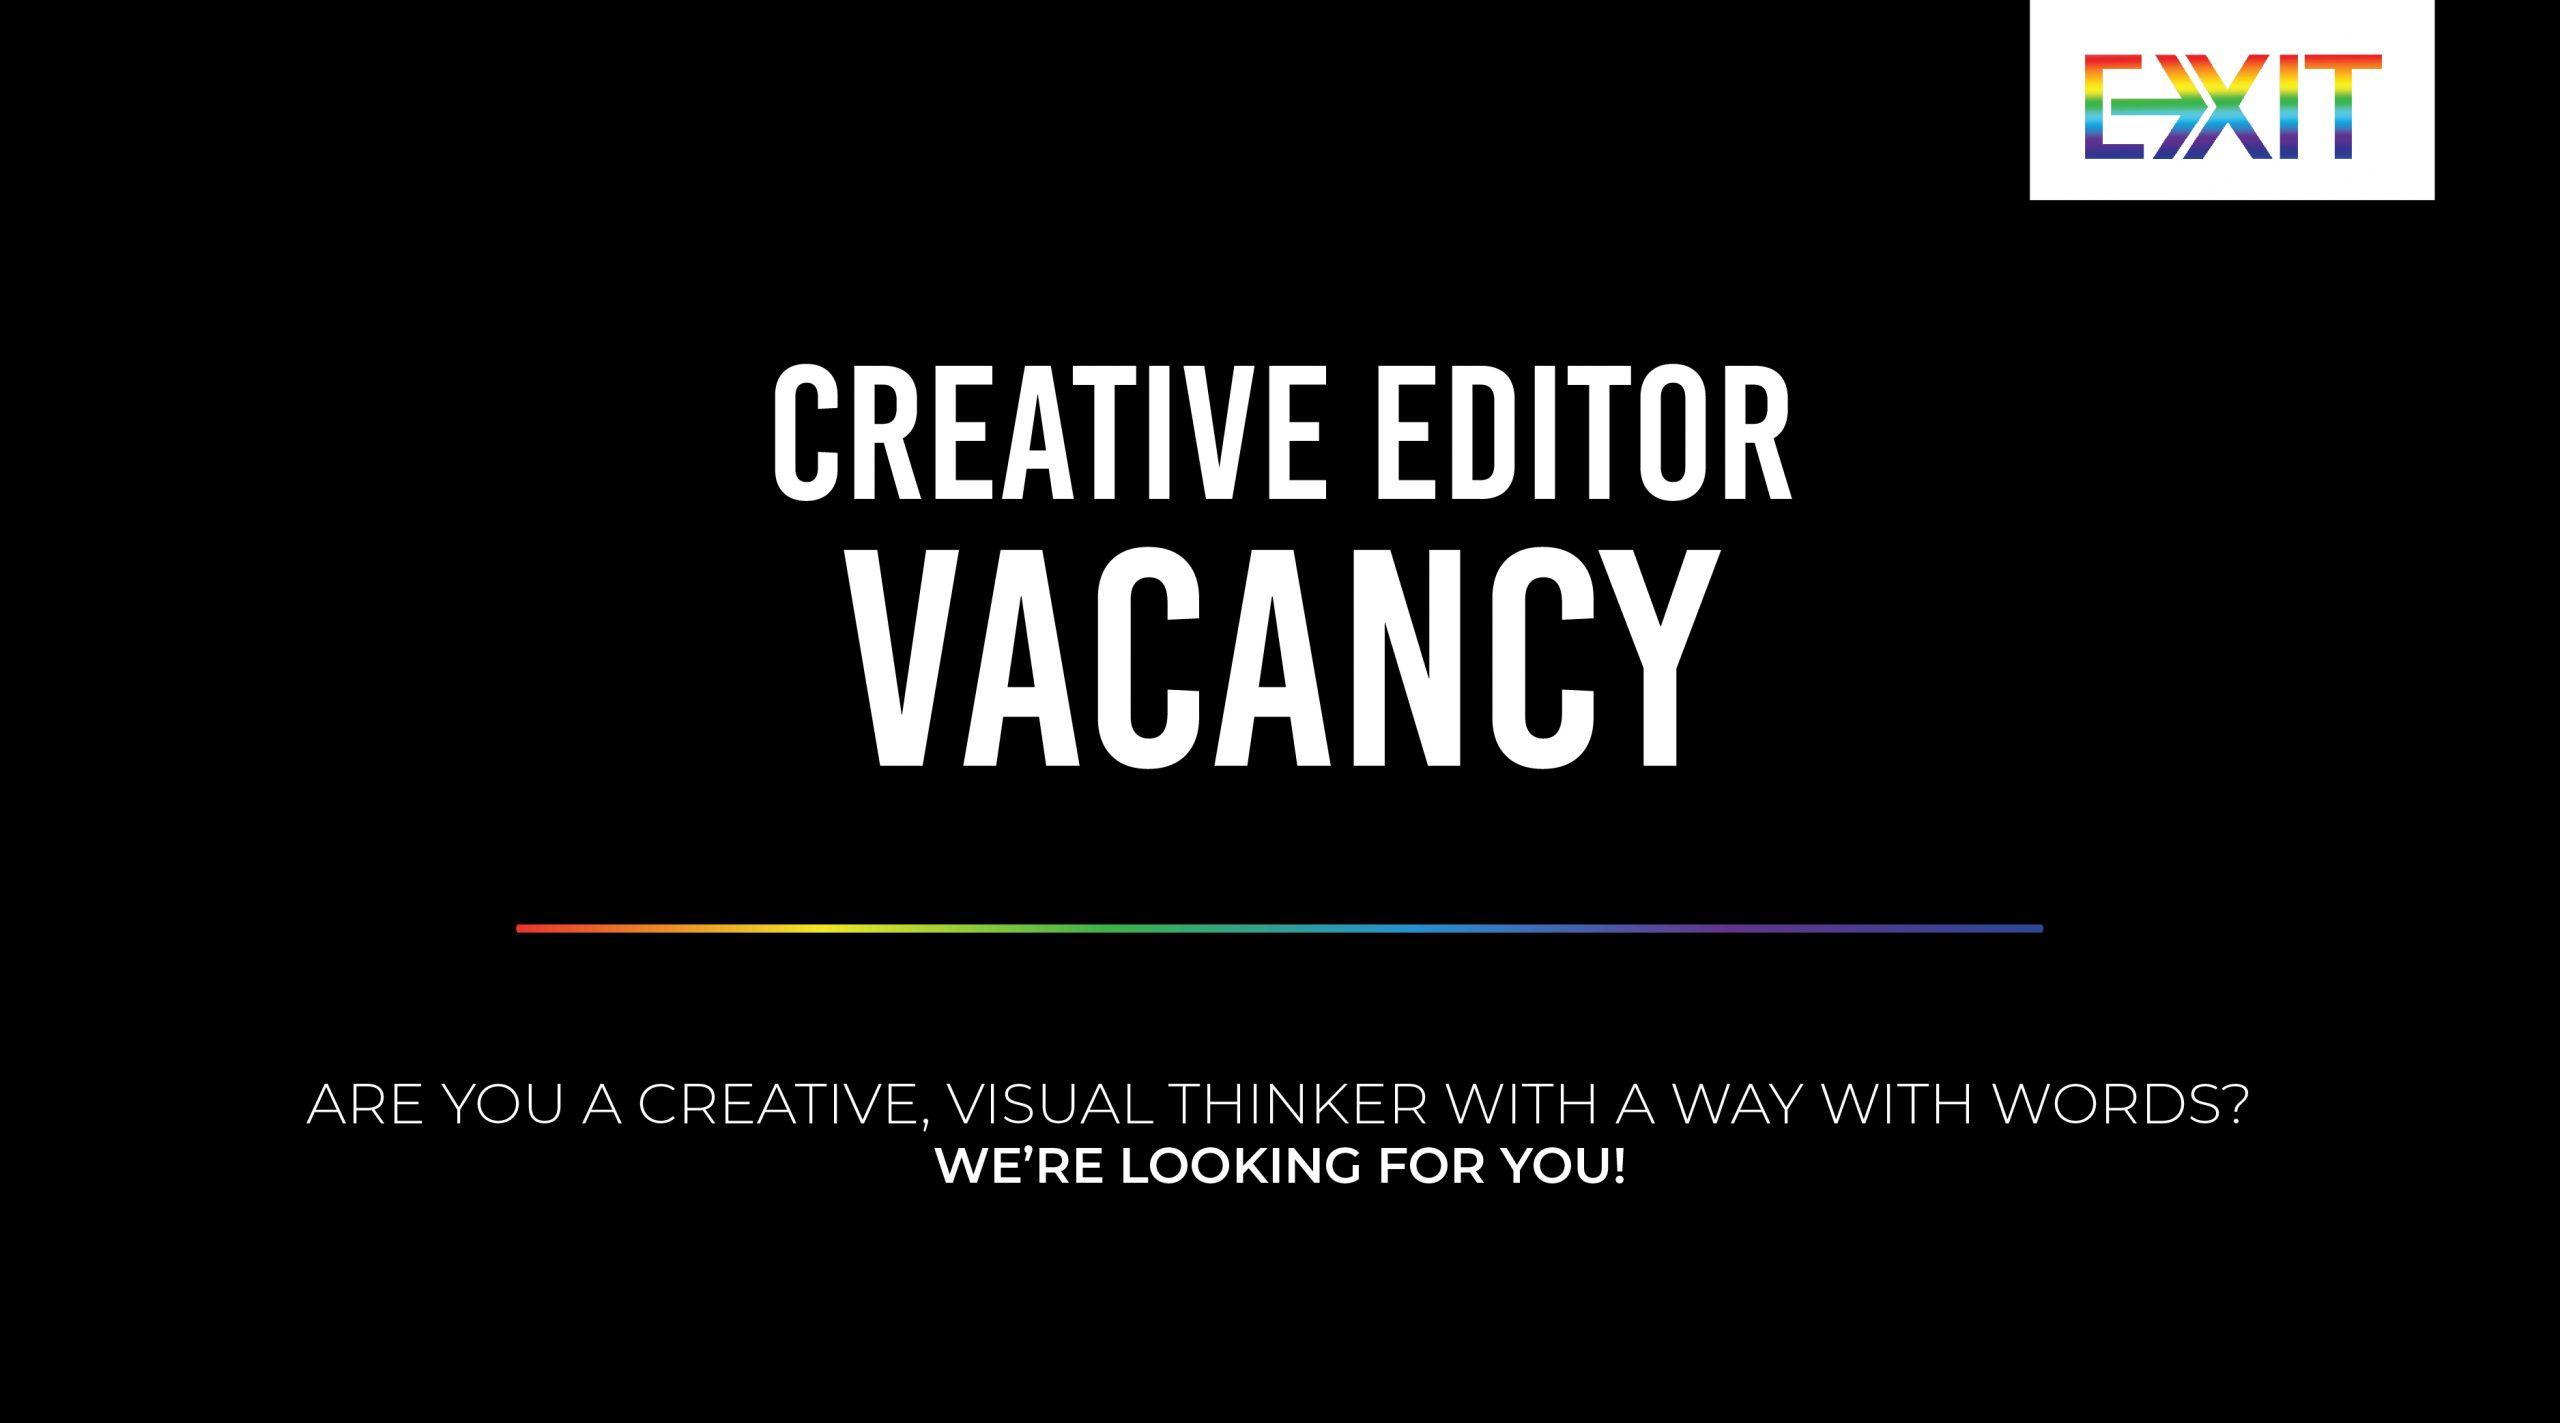 CREATIVE EDITOR WANTED!